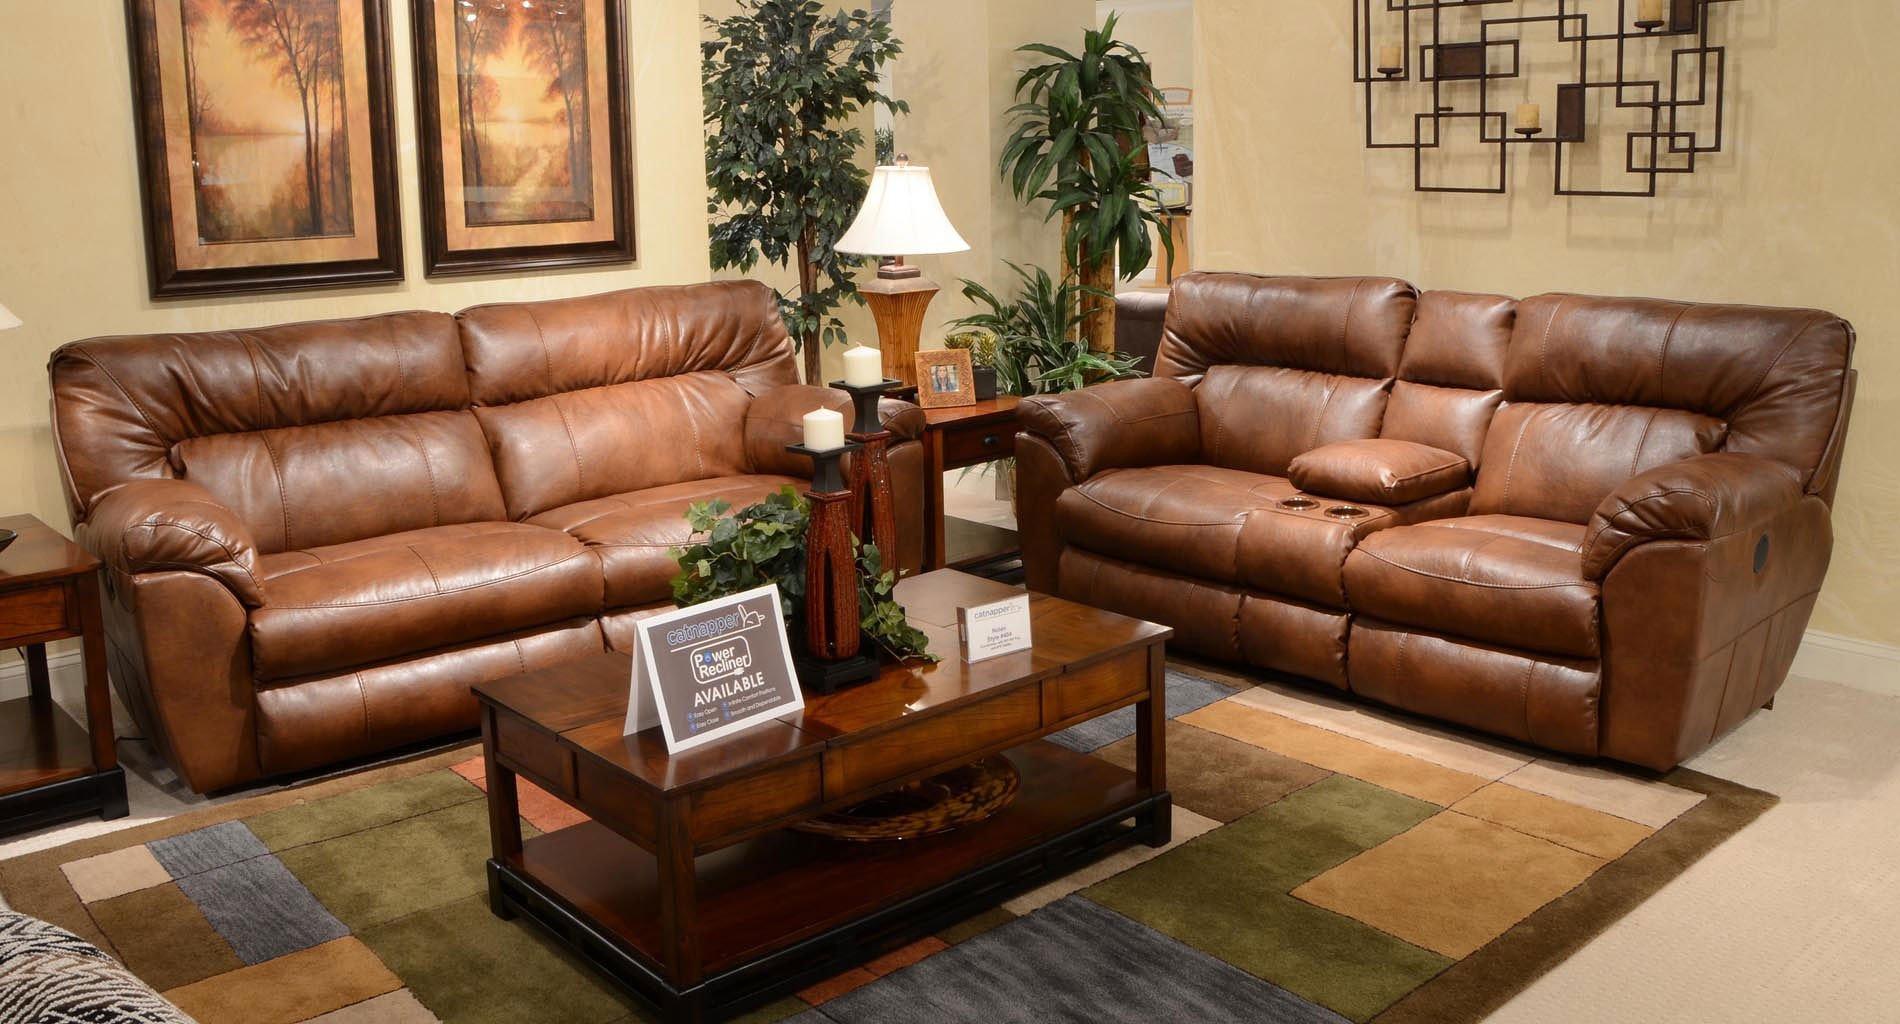 nolan power reclining sofa buchannan microfiber sectional with reversible chaise black living room set chestnut catnapper